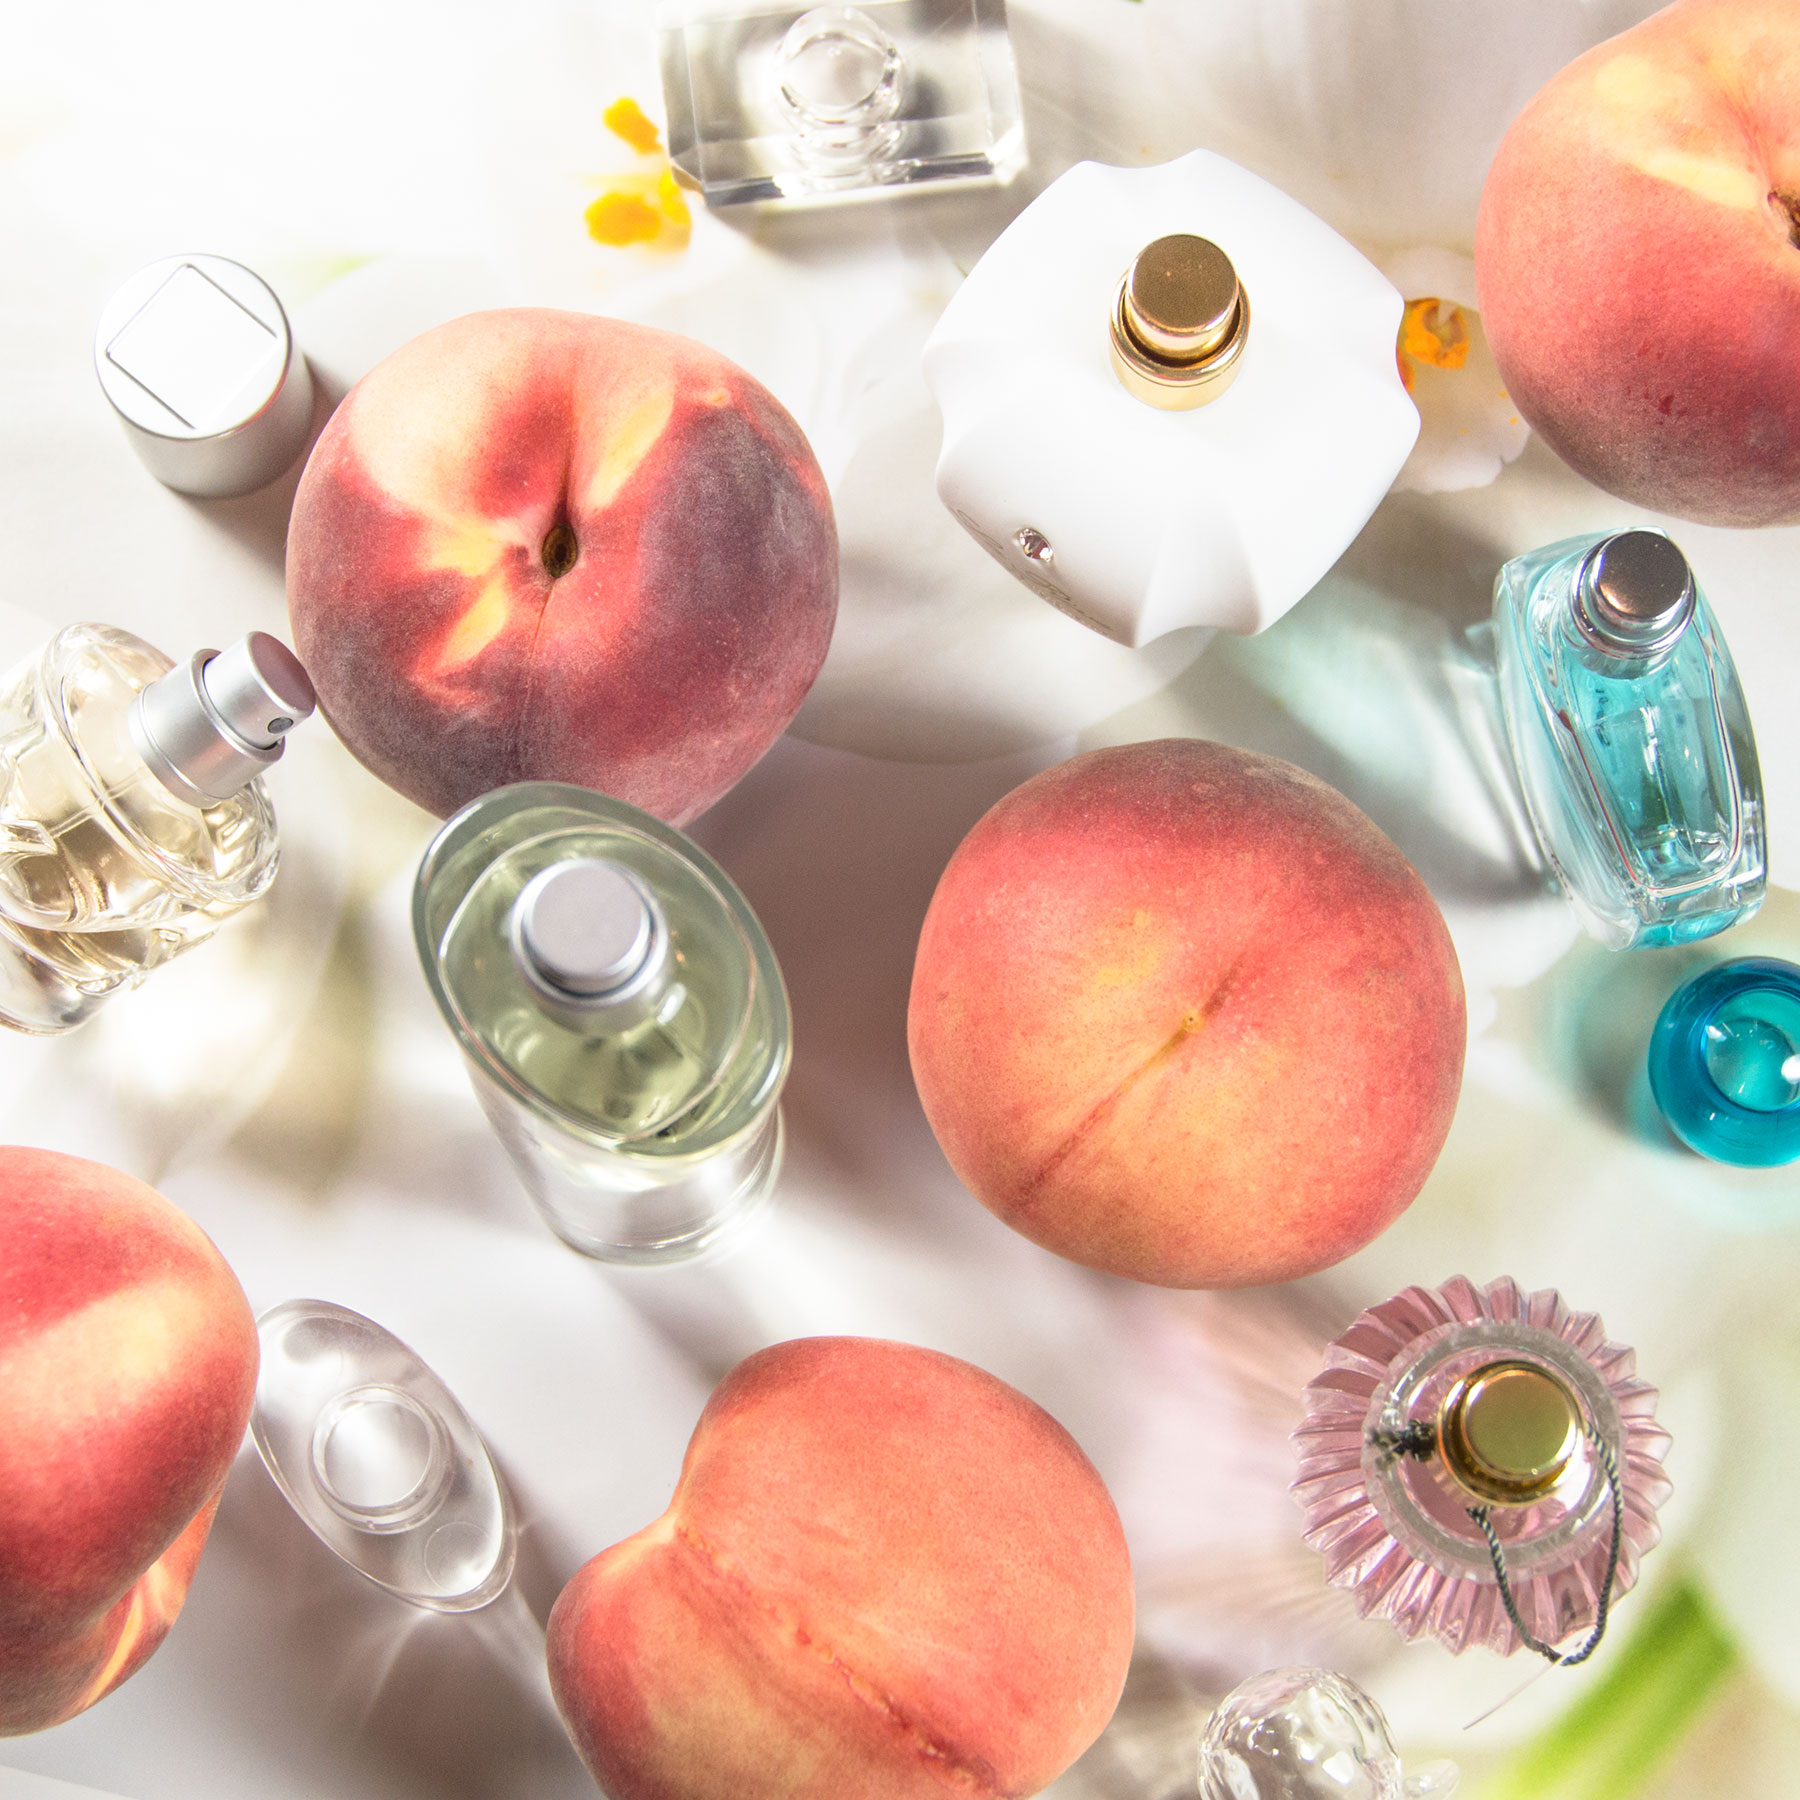 Billige Parfums